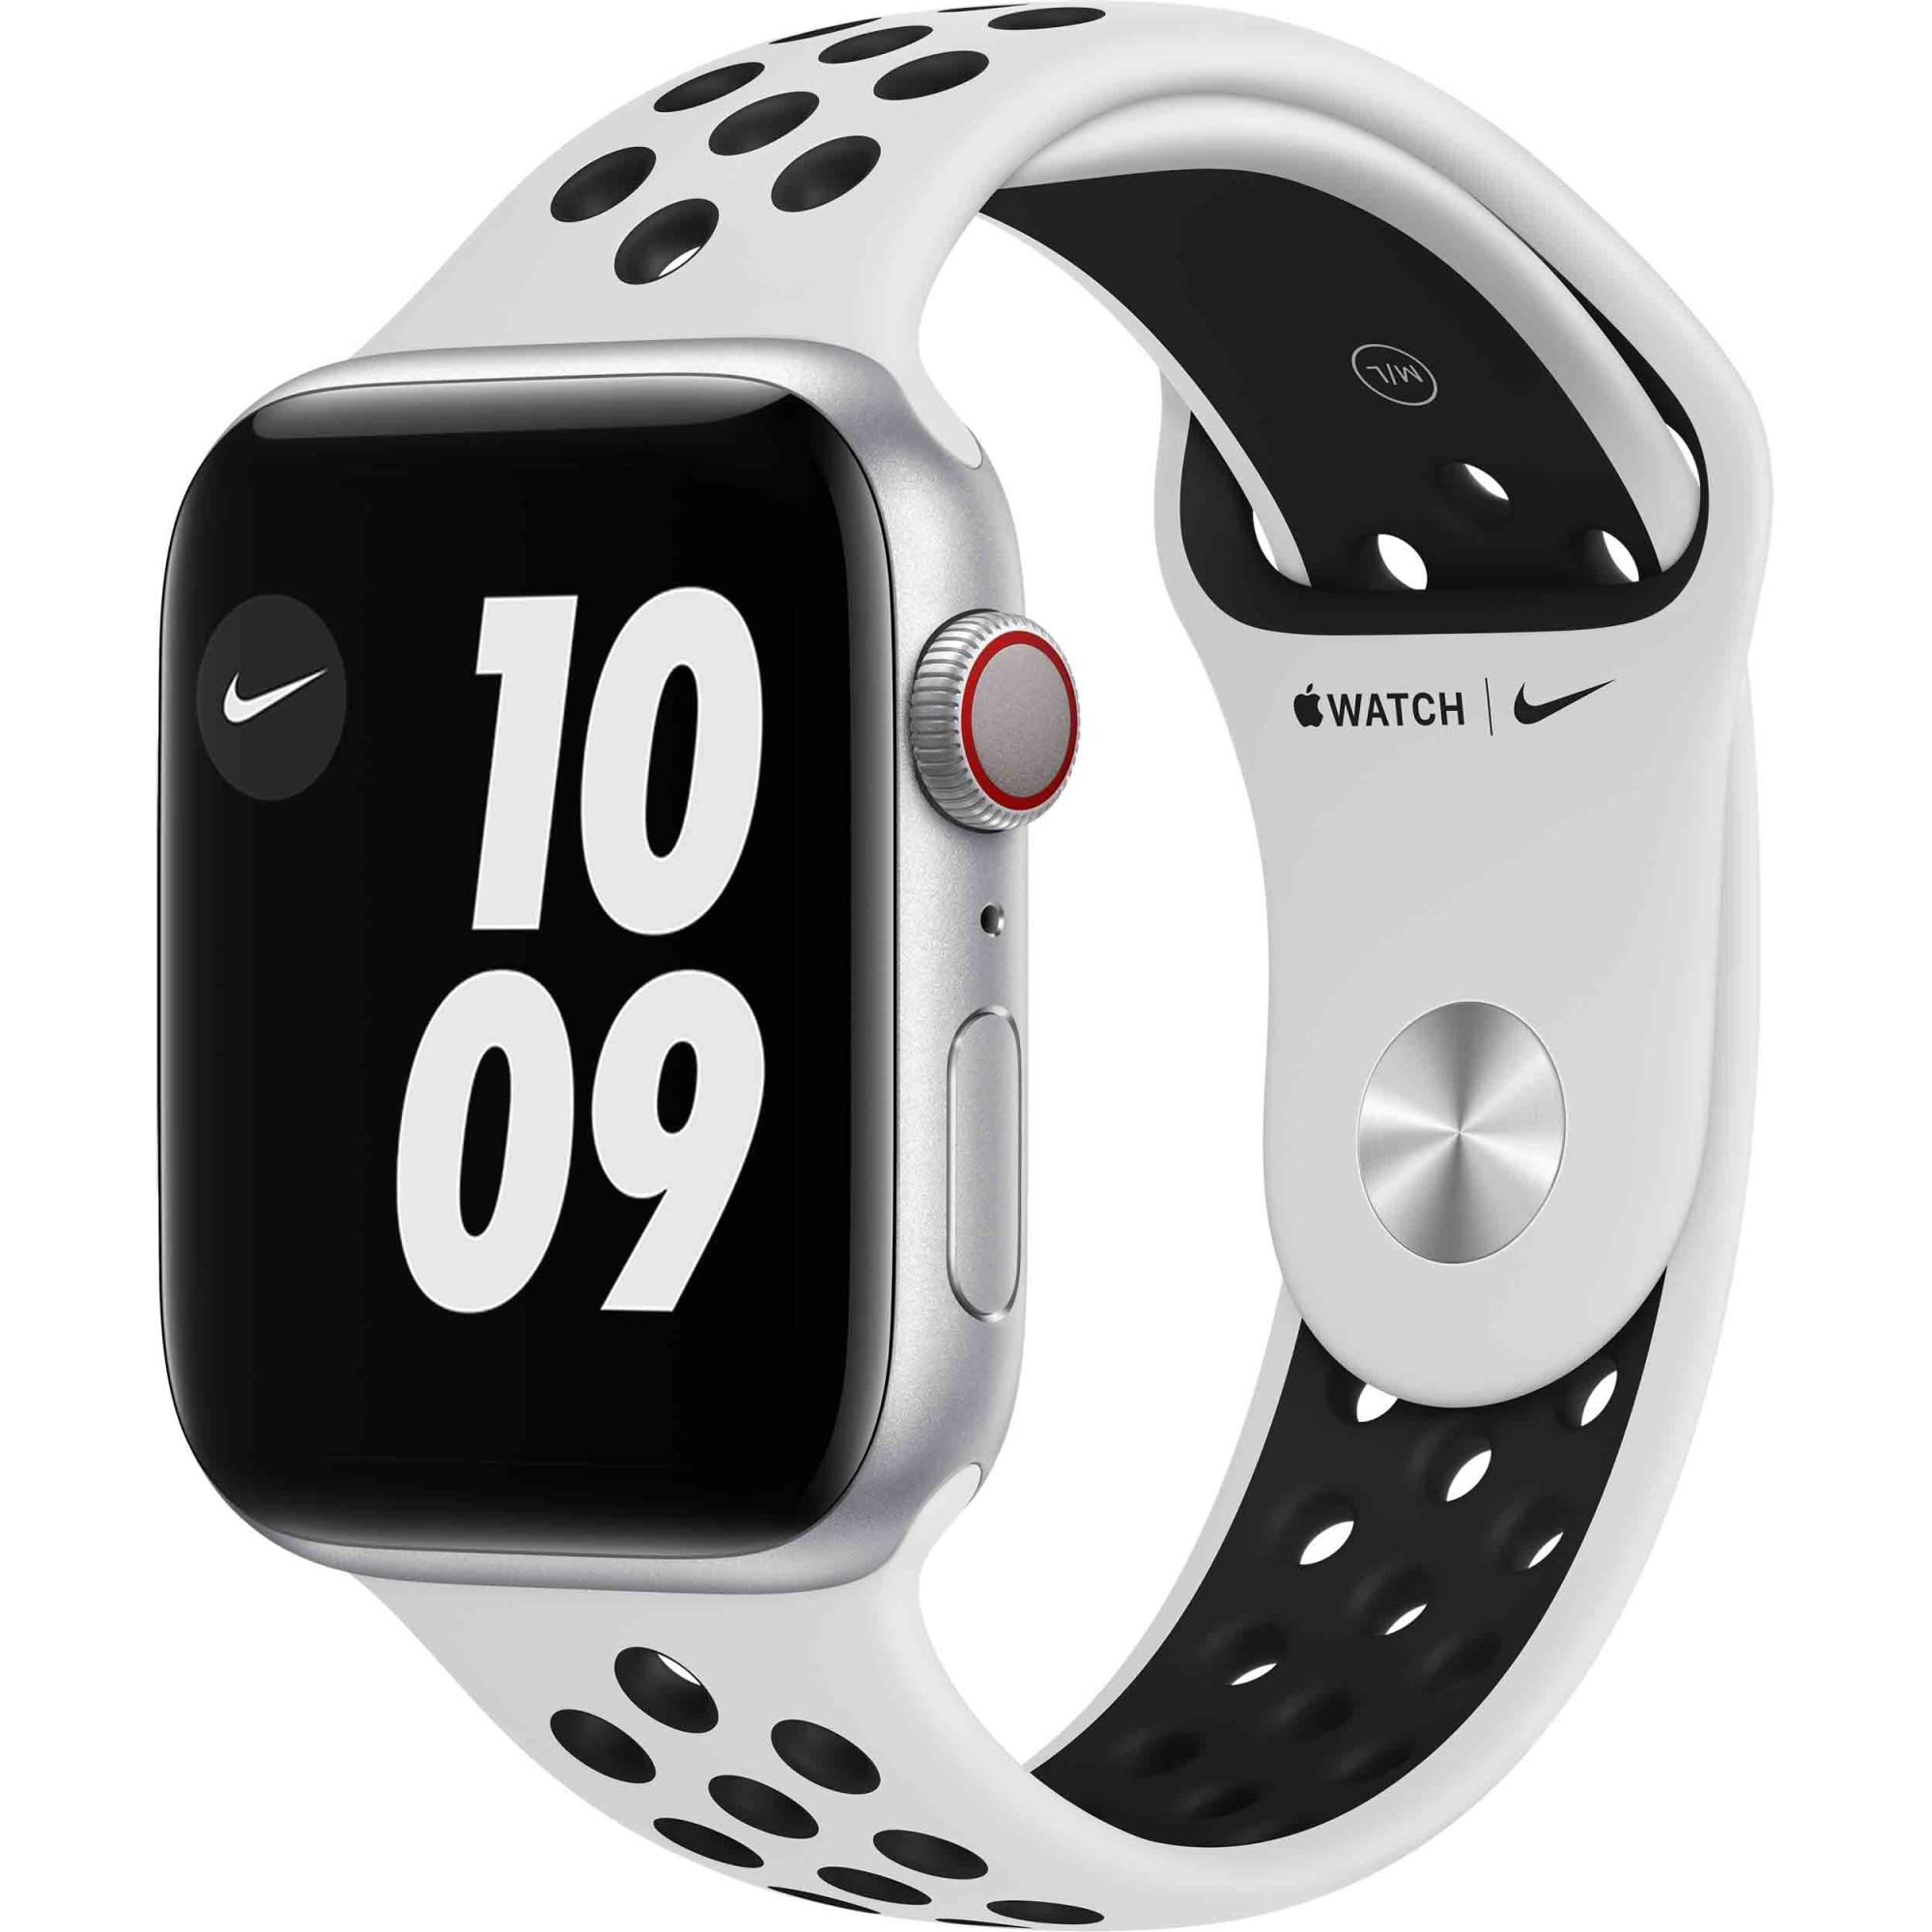 Fotografie Apple Watch Nike 6, GPS, Cellular, Carcasa Silver Aluminium 44mm, Pure Platinum/Black Nike Sport Band